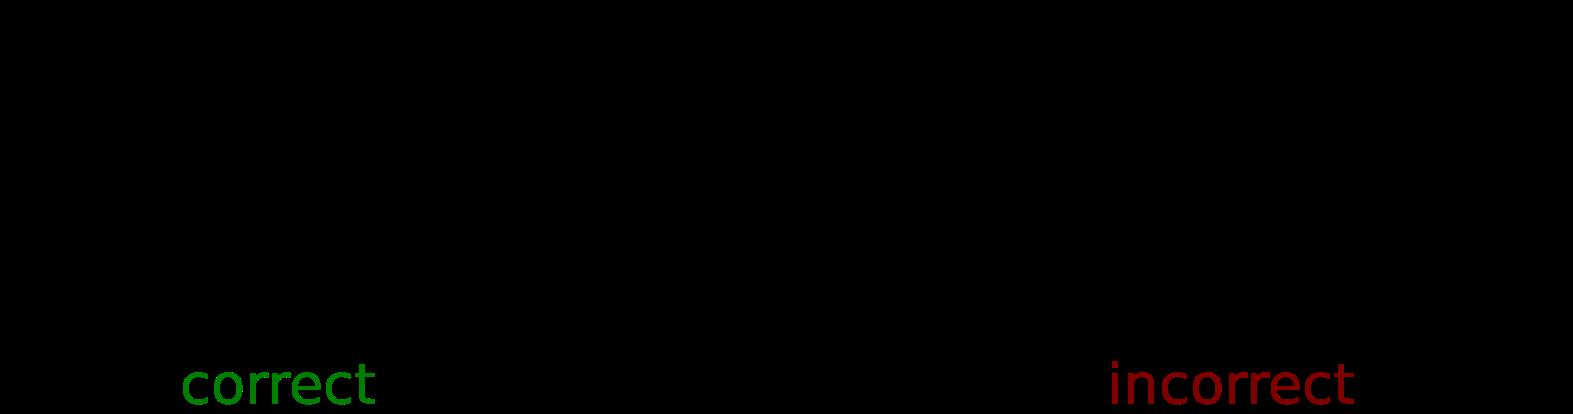 Difference Between Aufbau Principle And Hund U0026 39 S Rule